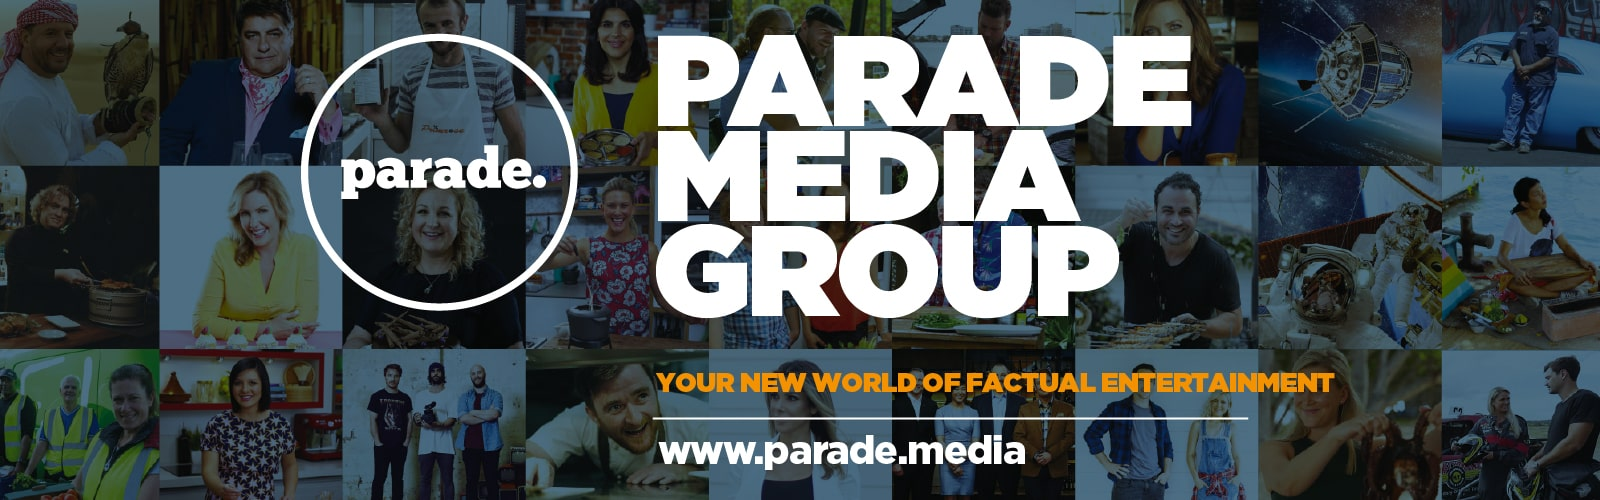 Parade Media Group